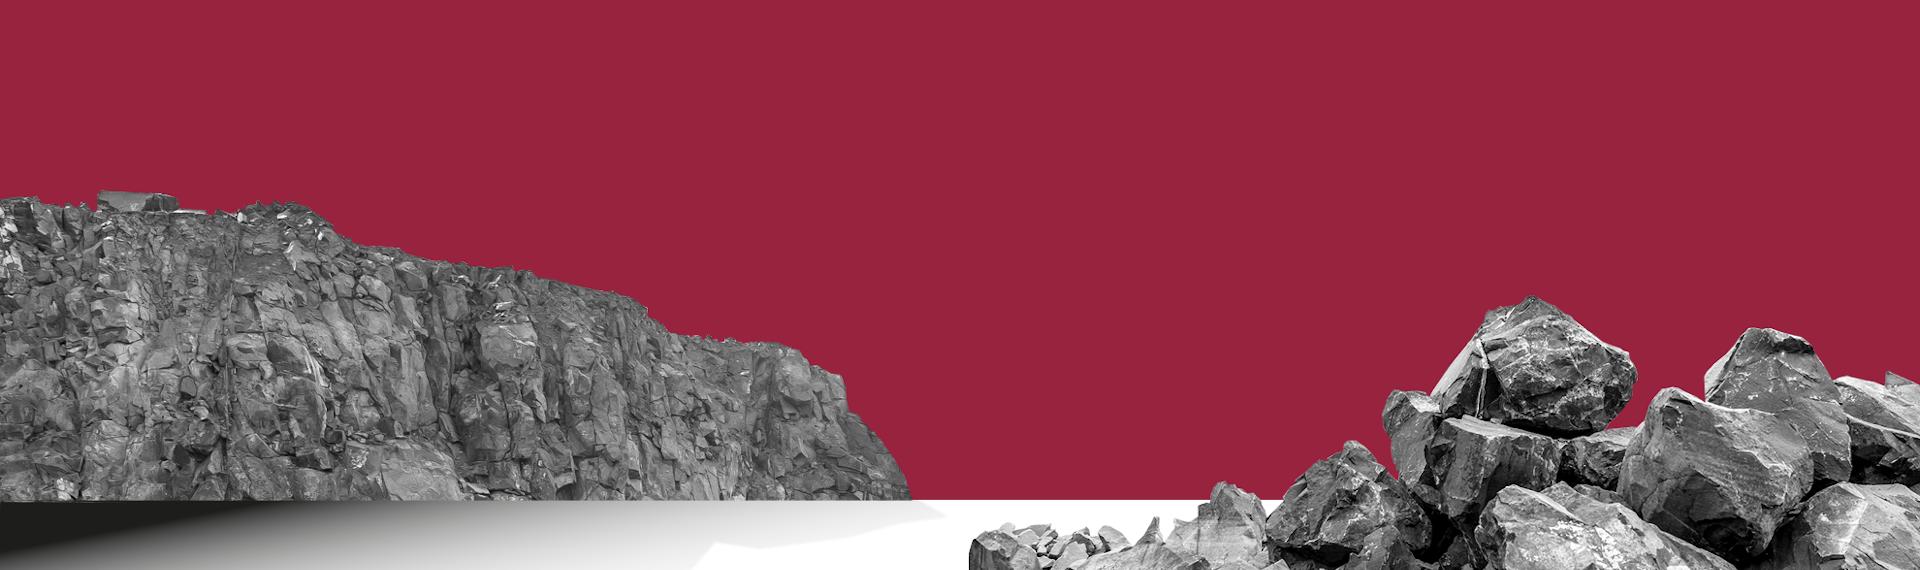 klippor mot röd bakgrund